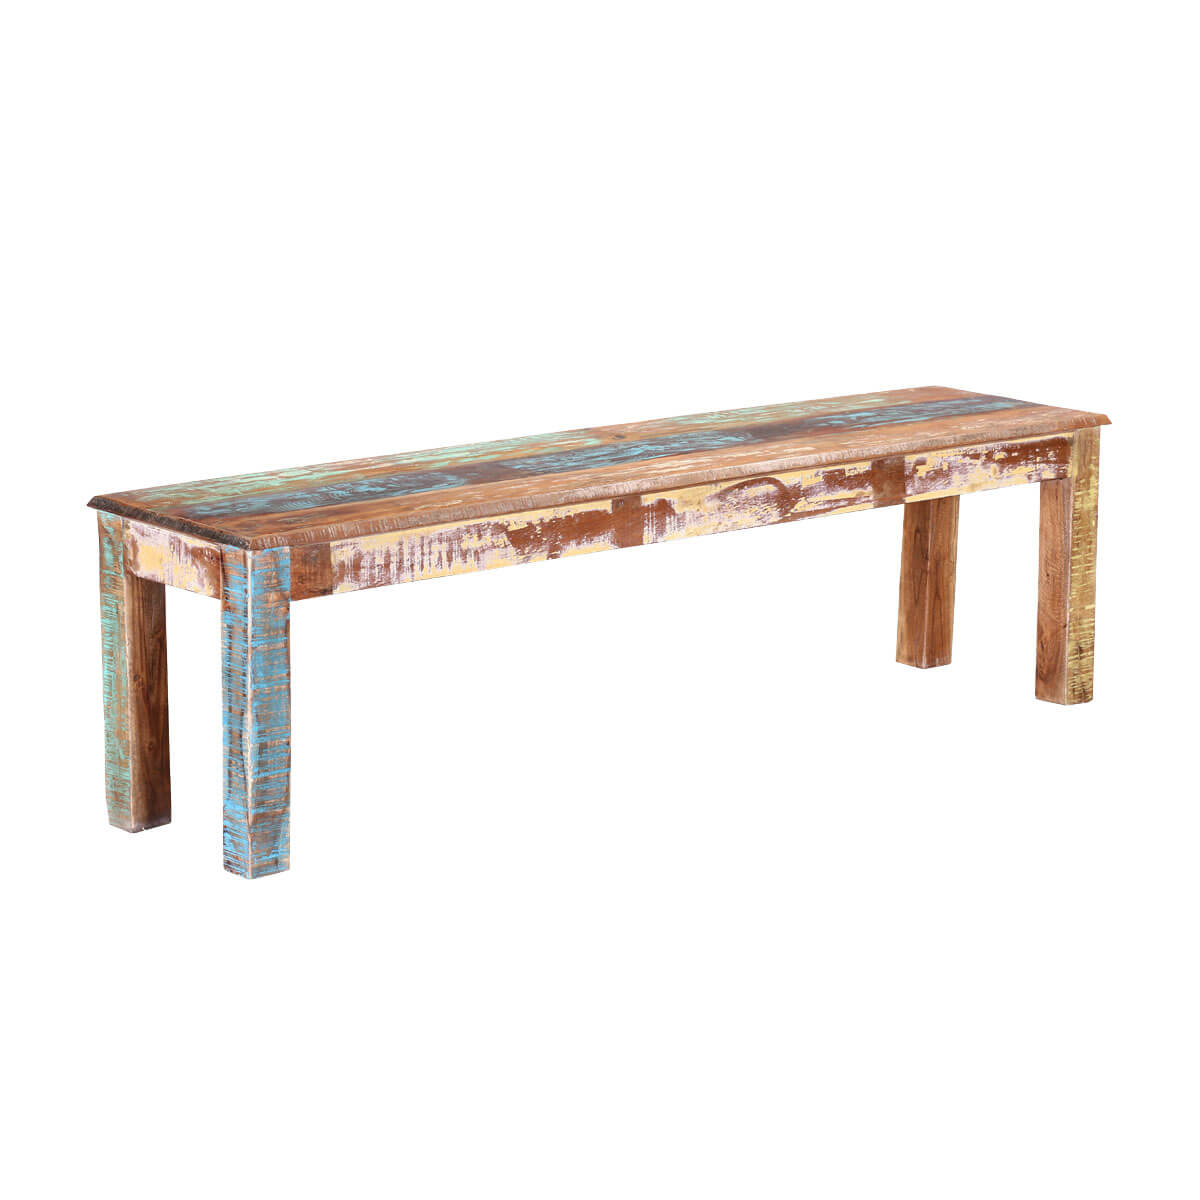 Strange Olsen Rustic Colors Reclaimed Wood Backless Dining Bench Spiritservingveterans Wood Chair Design Ideas Spiritservingveteransorg